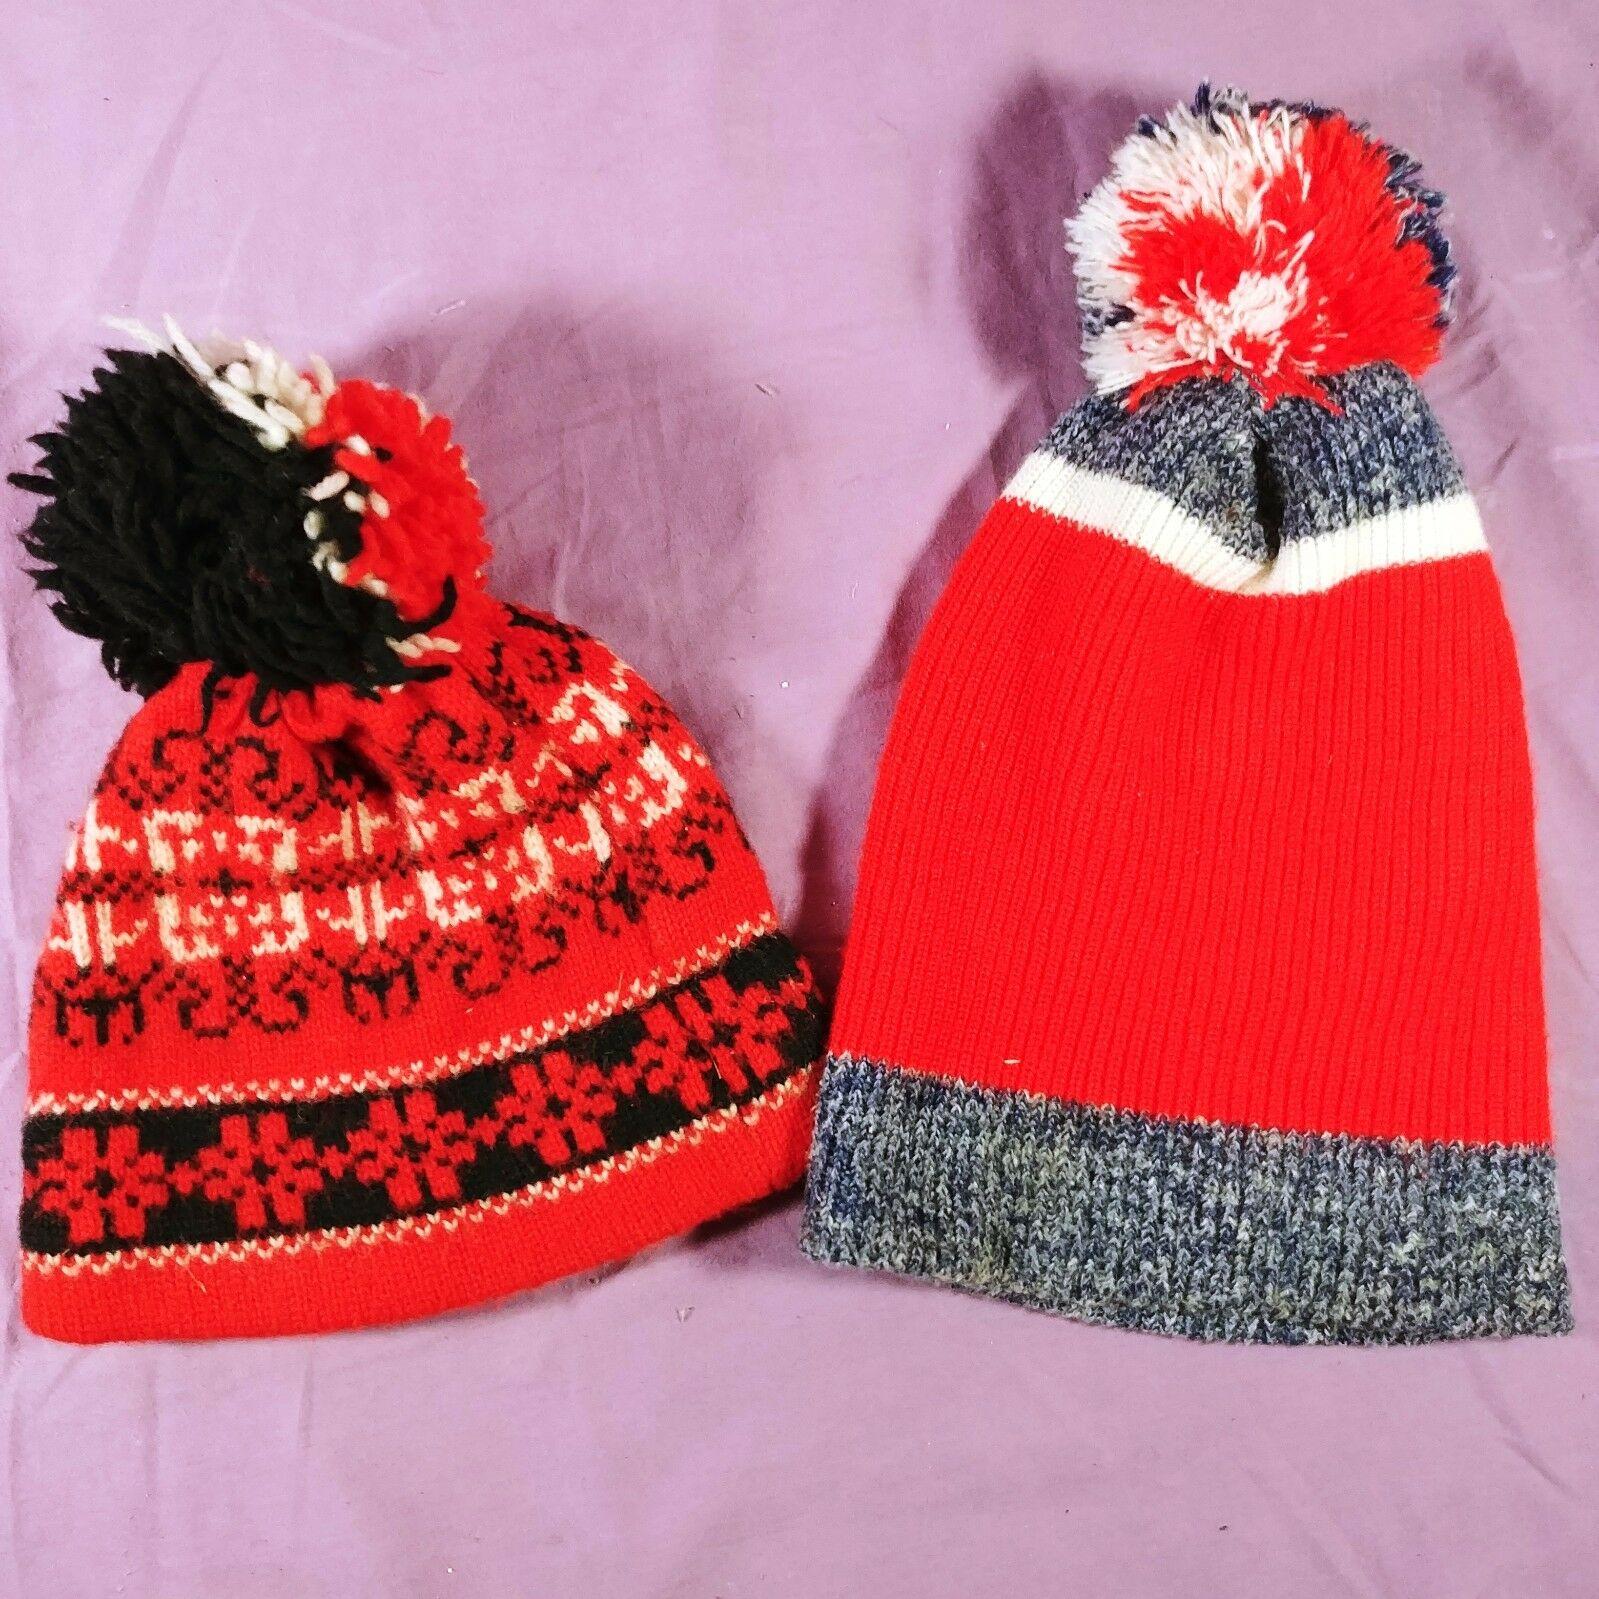 27ef22503bced4 ... Winter Pom Pom Red White Black. 🔍. 2-vintage-knit-beanie-knit-cap-hat -warm-